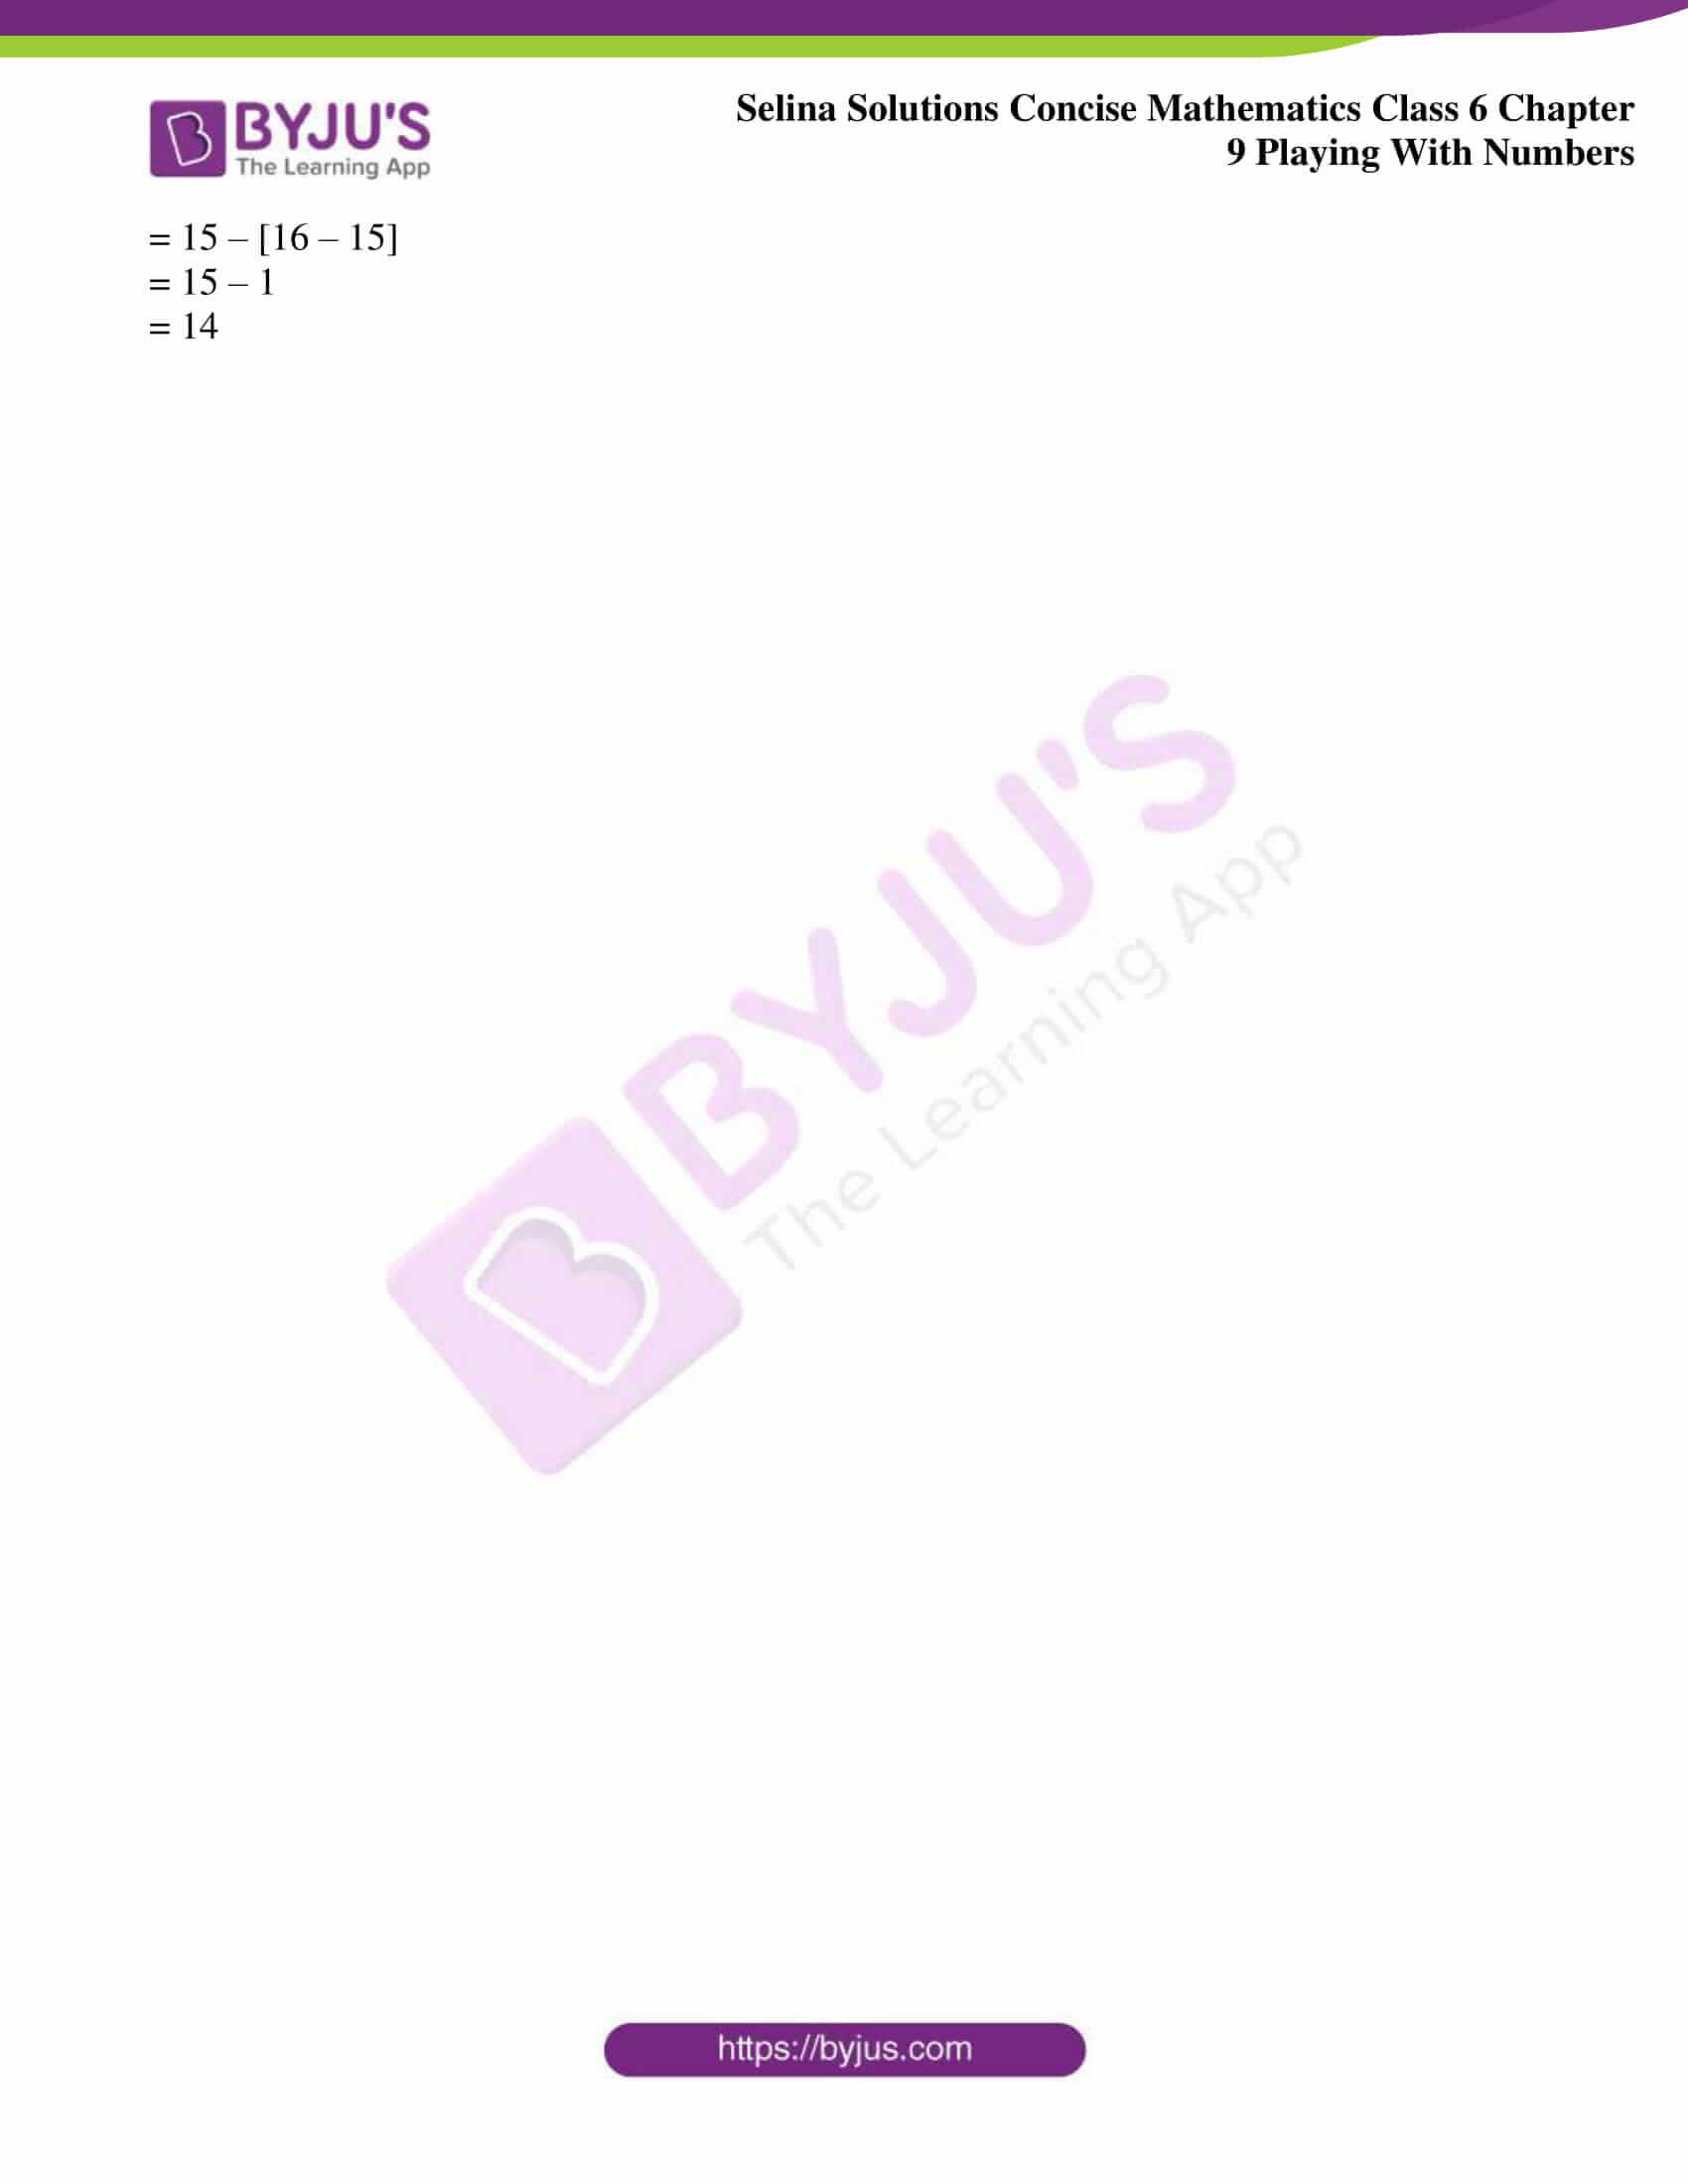 selina sol concise mathematics class 6 ch 9 ex a 4